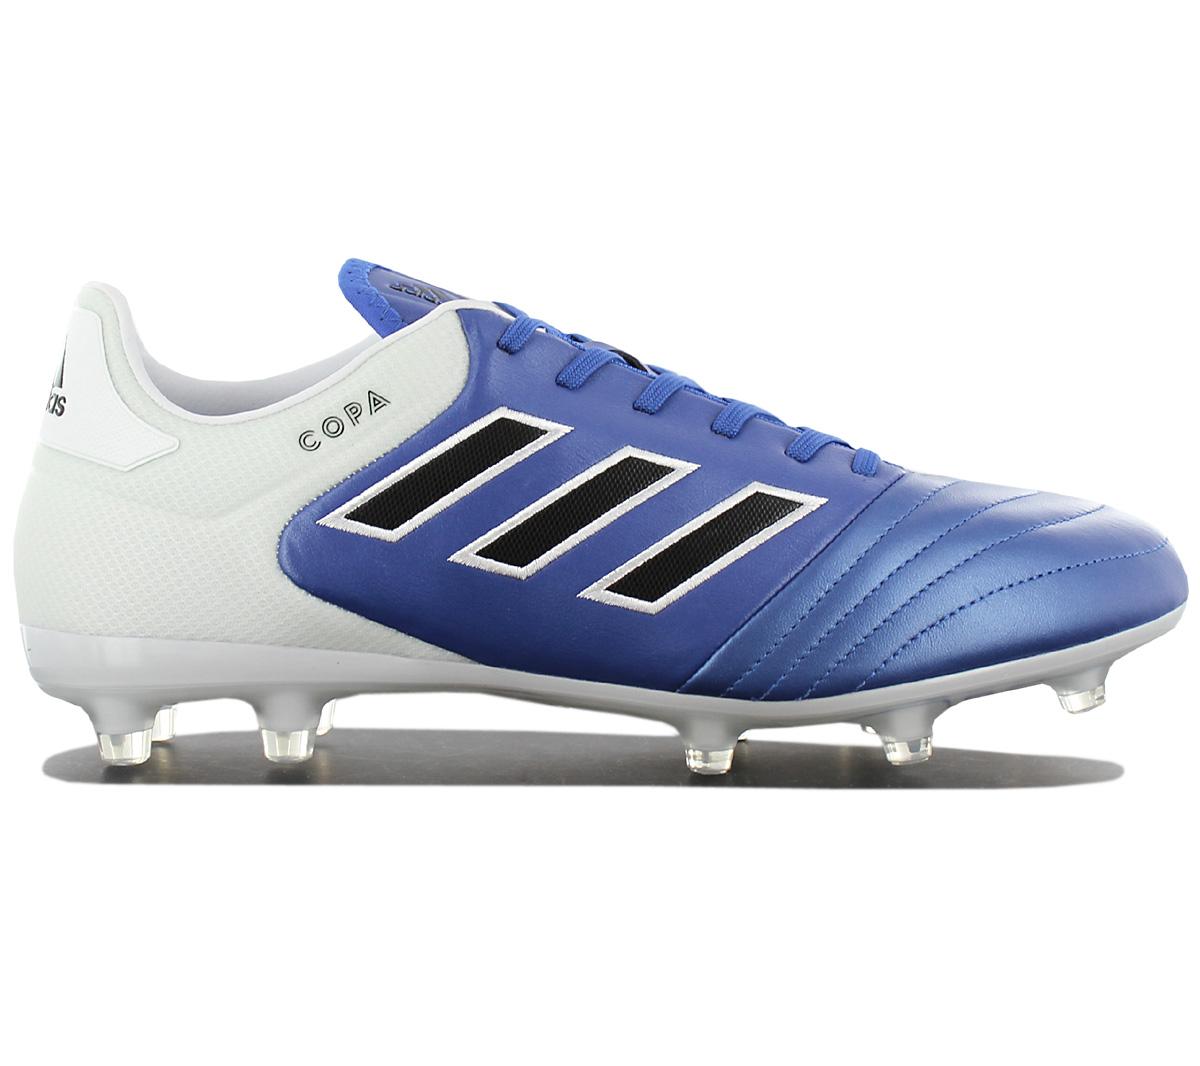 Adidas Copa 17.2 Fg Men s Cam Shoes Leather Blue Mundial BA8521 New ... aed67748c